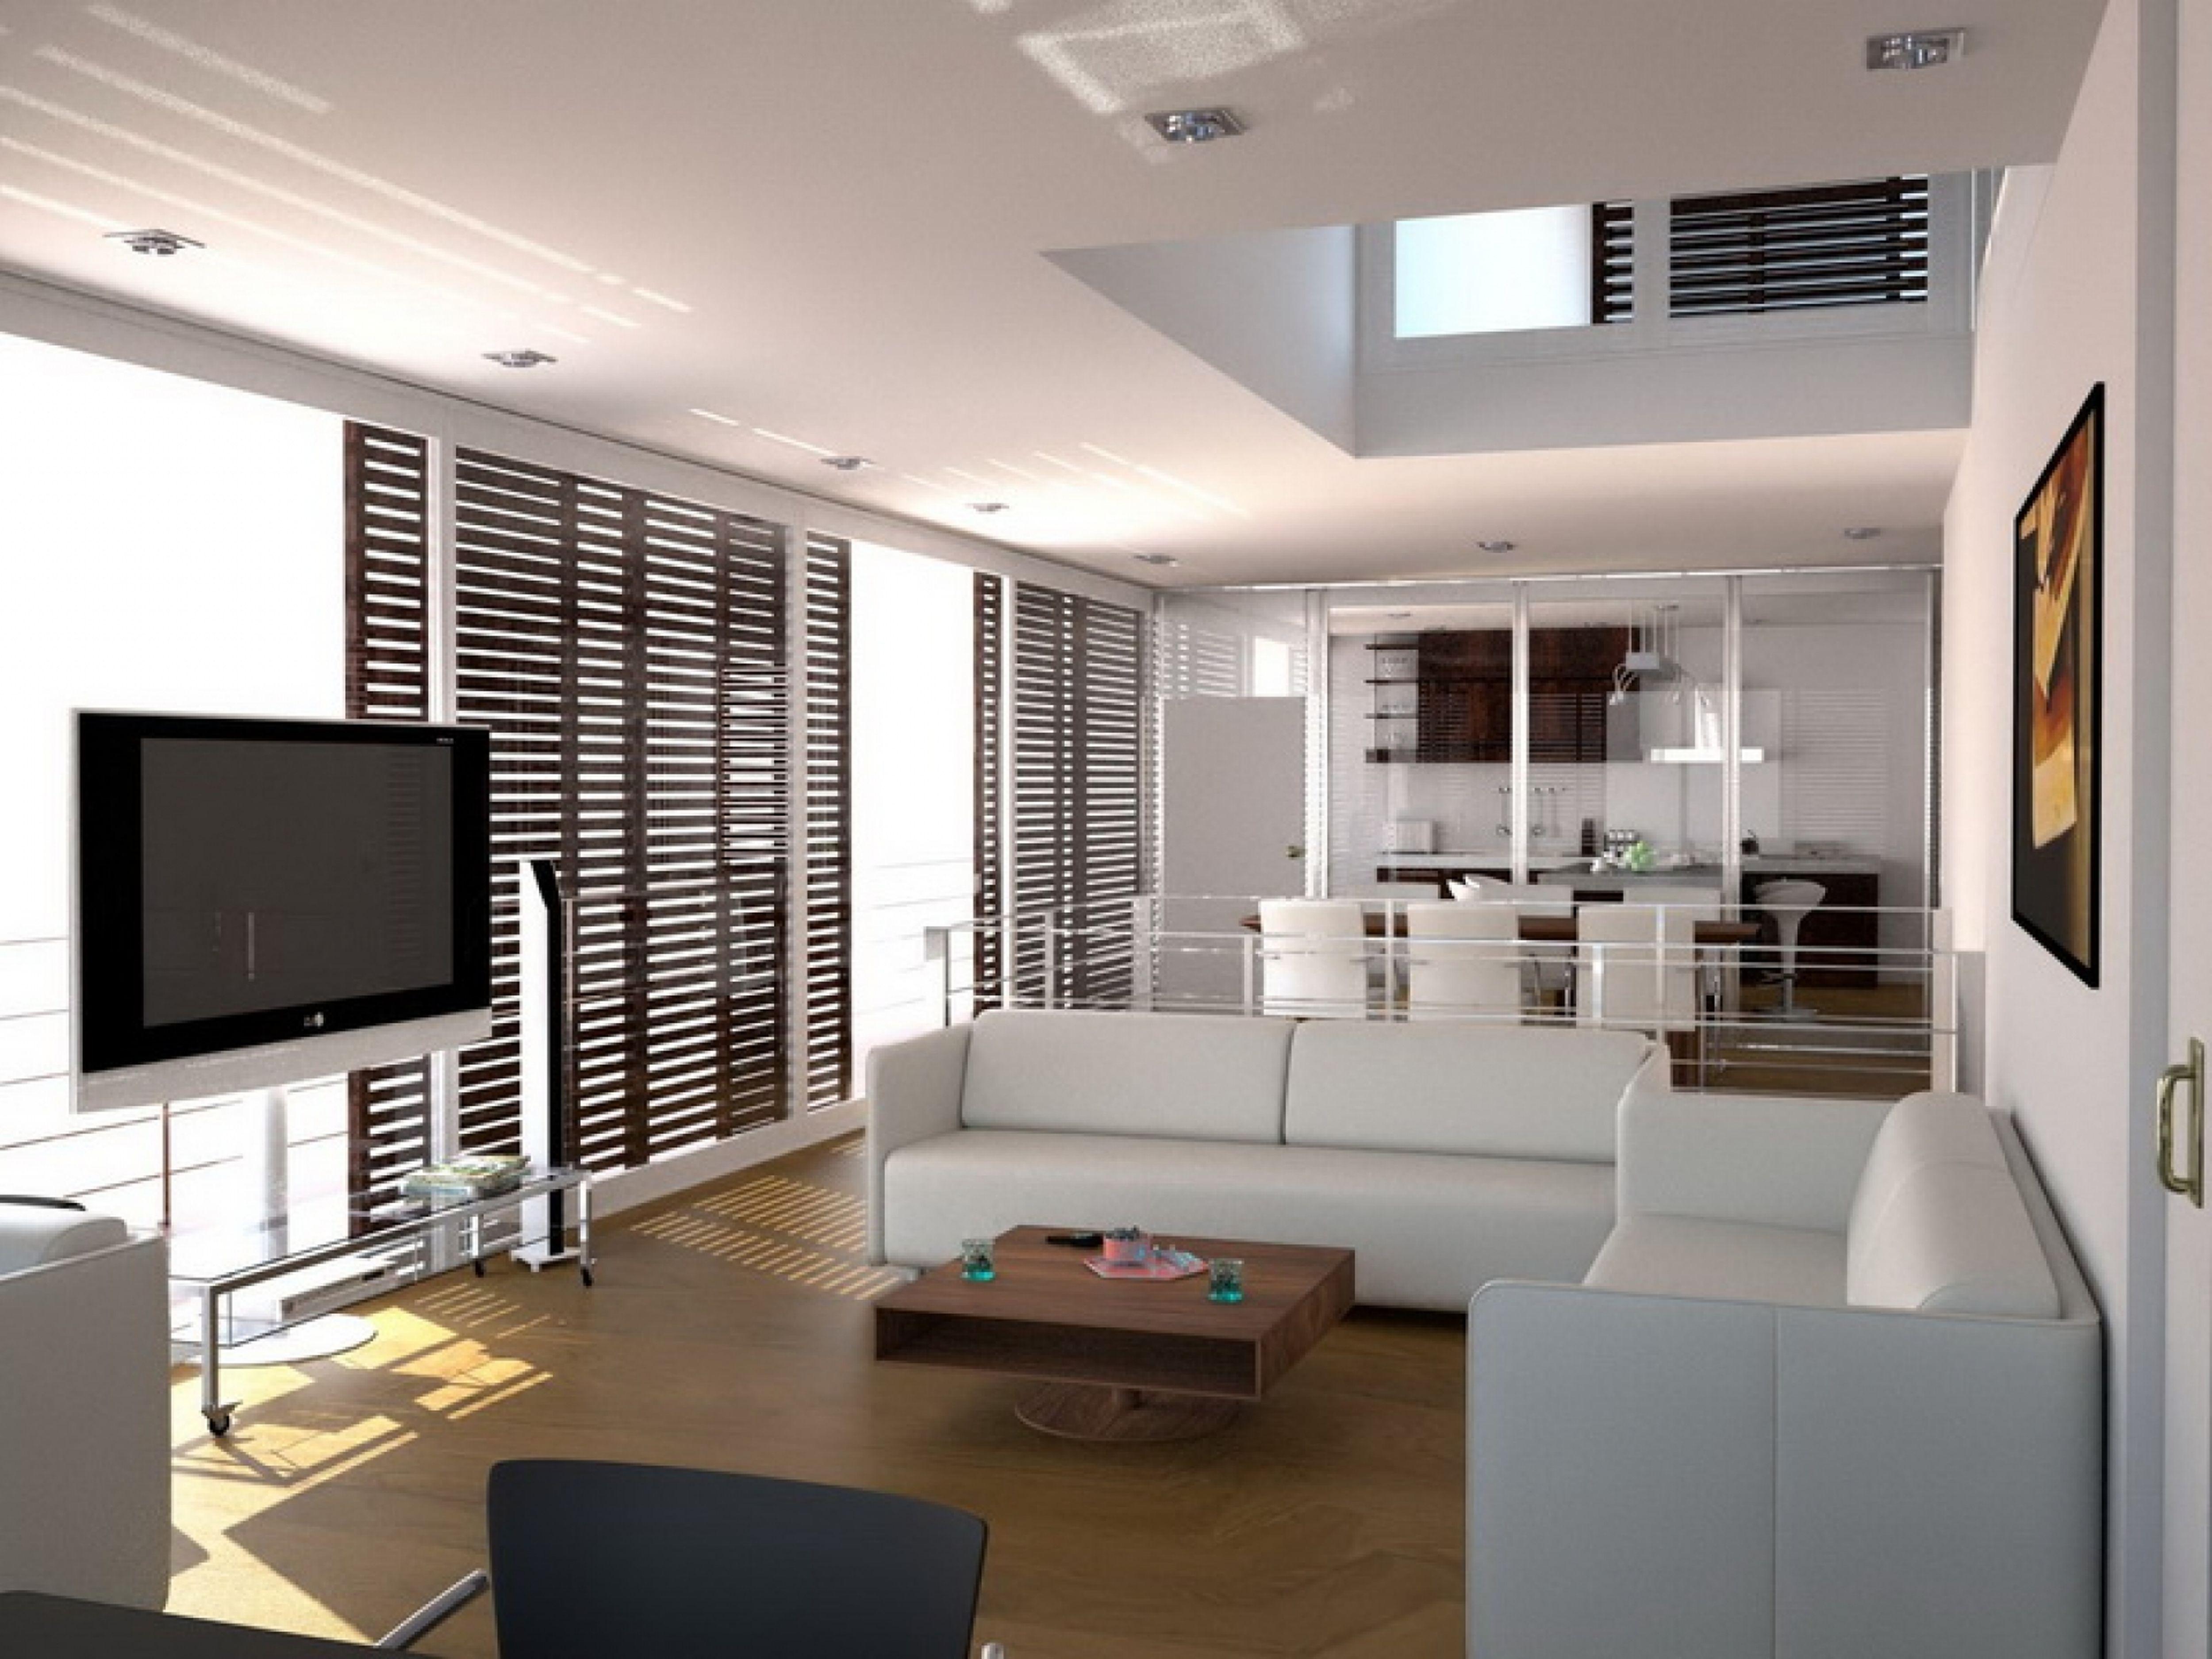 Studio apartment design google keresés